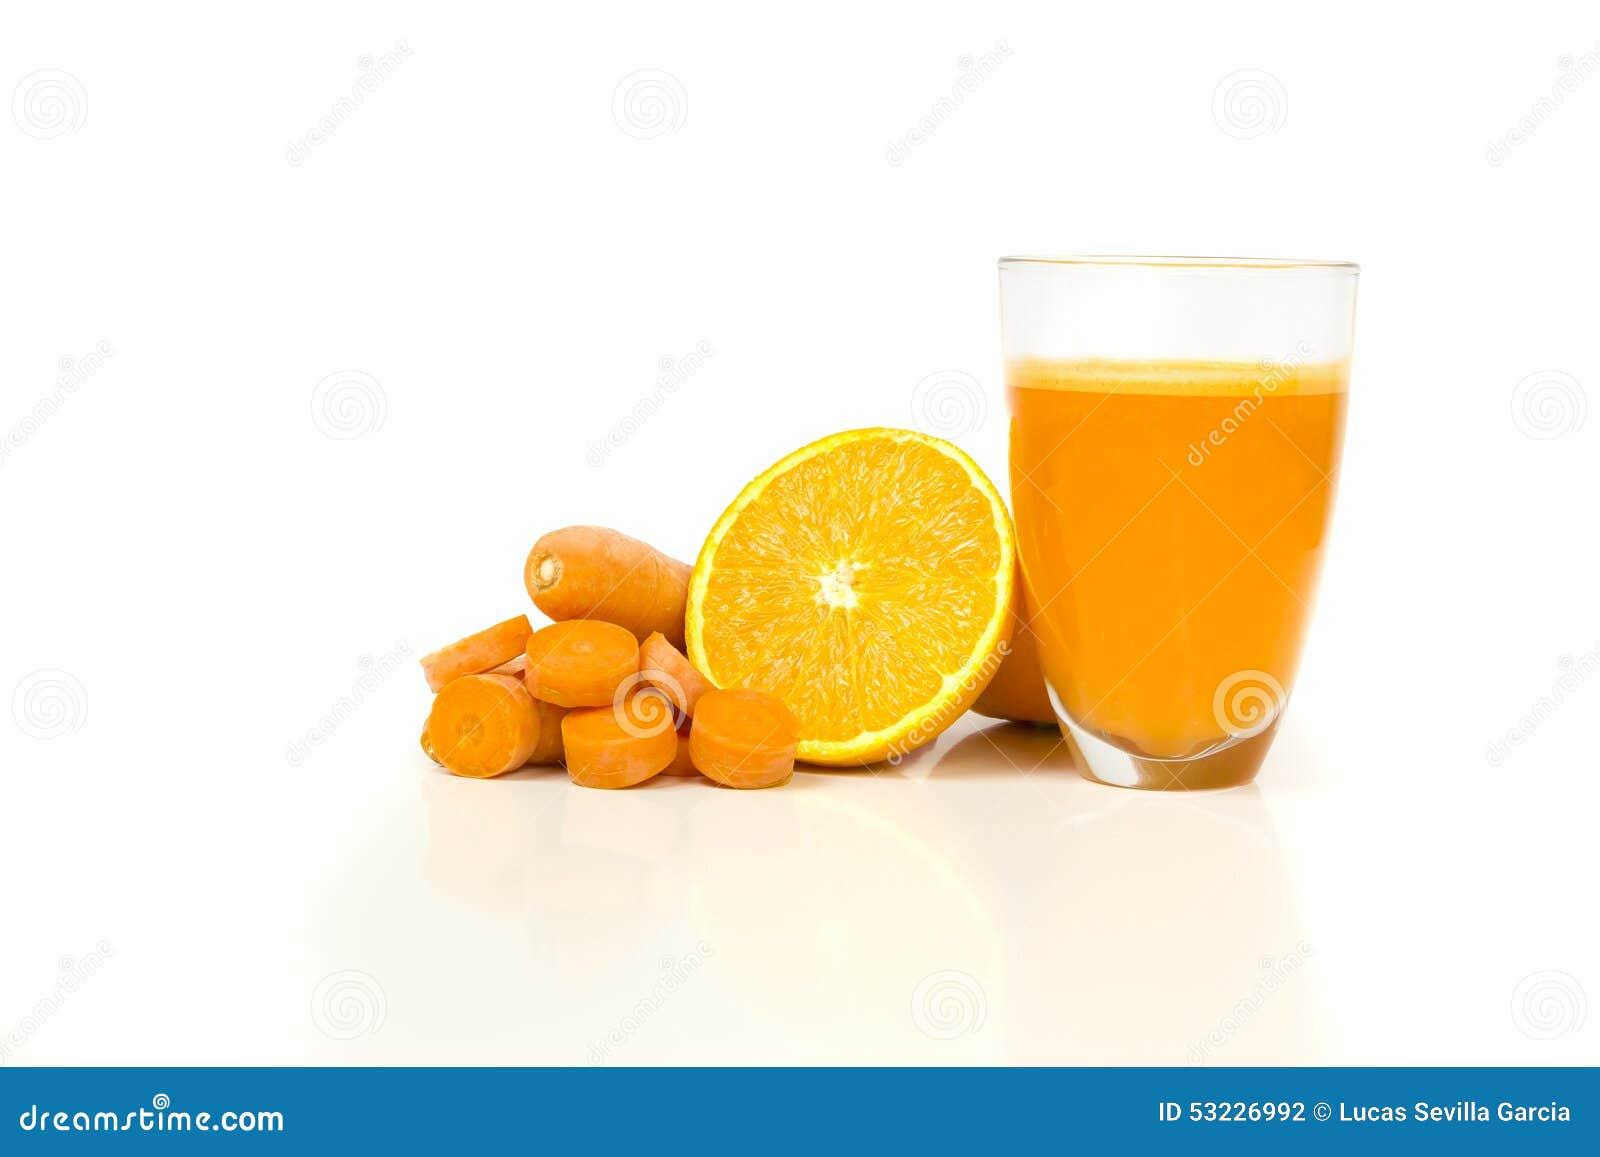 Naranja y jugo de zanahorias